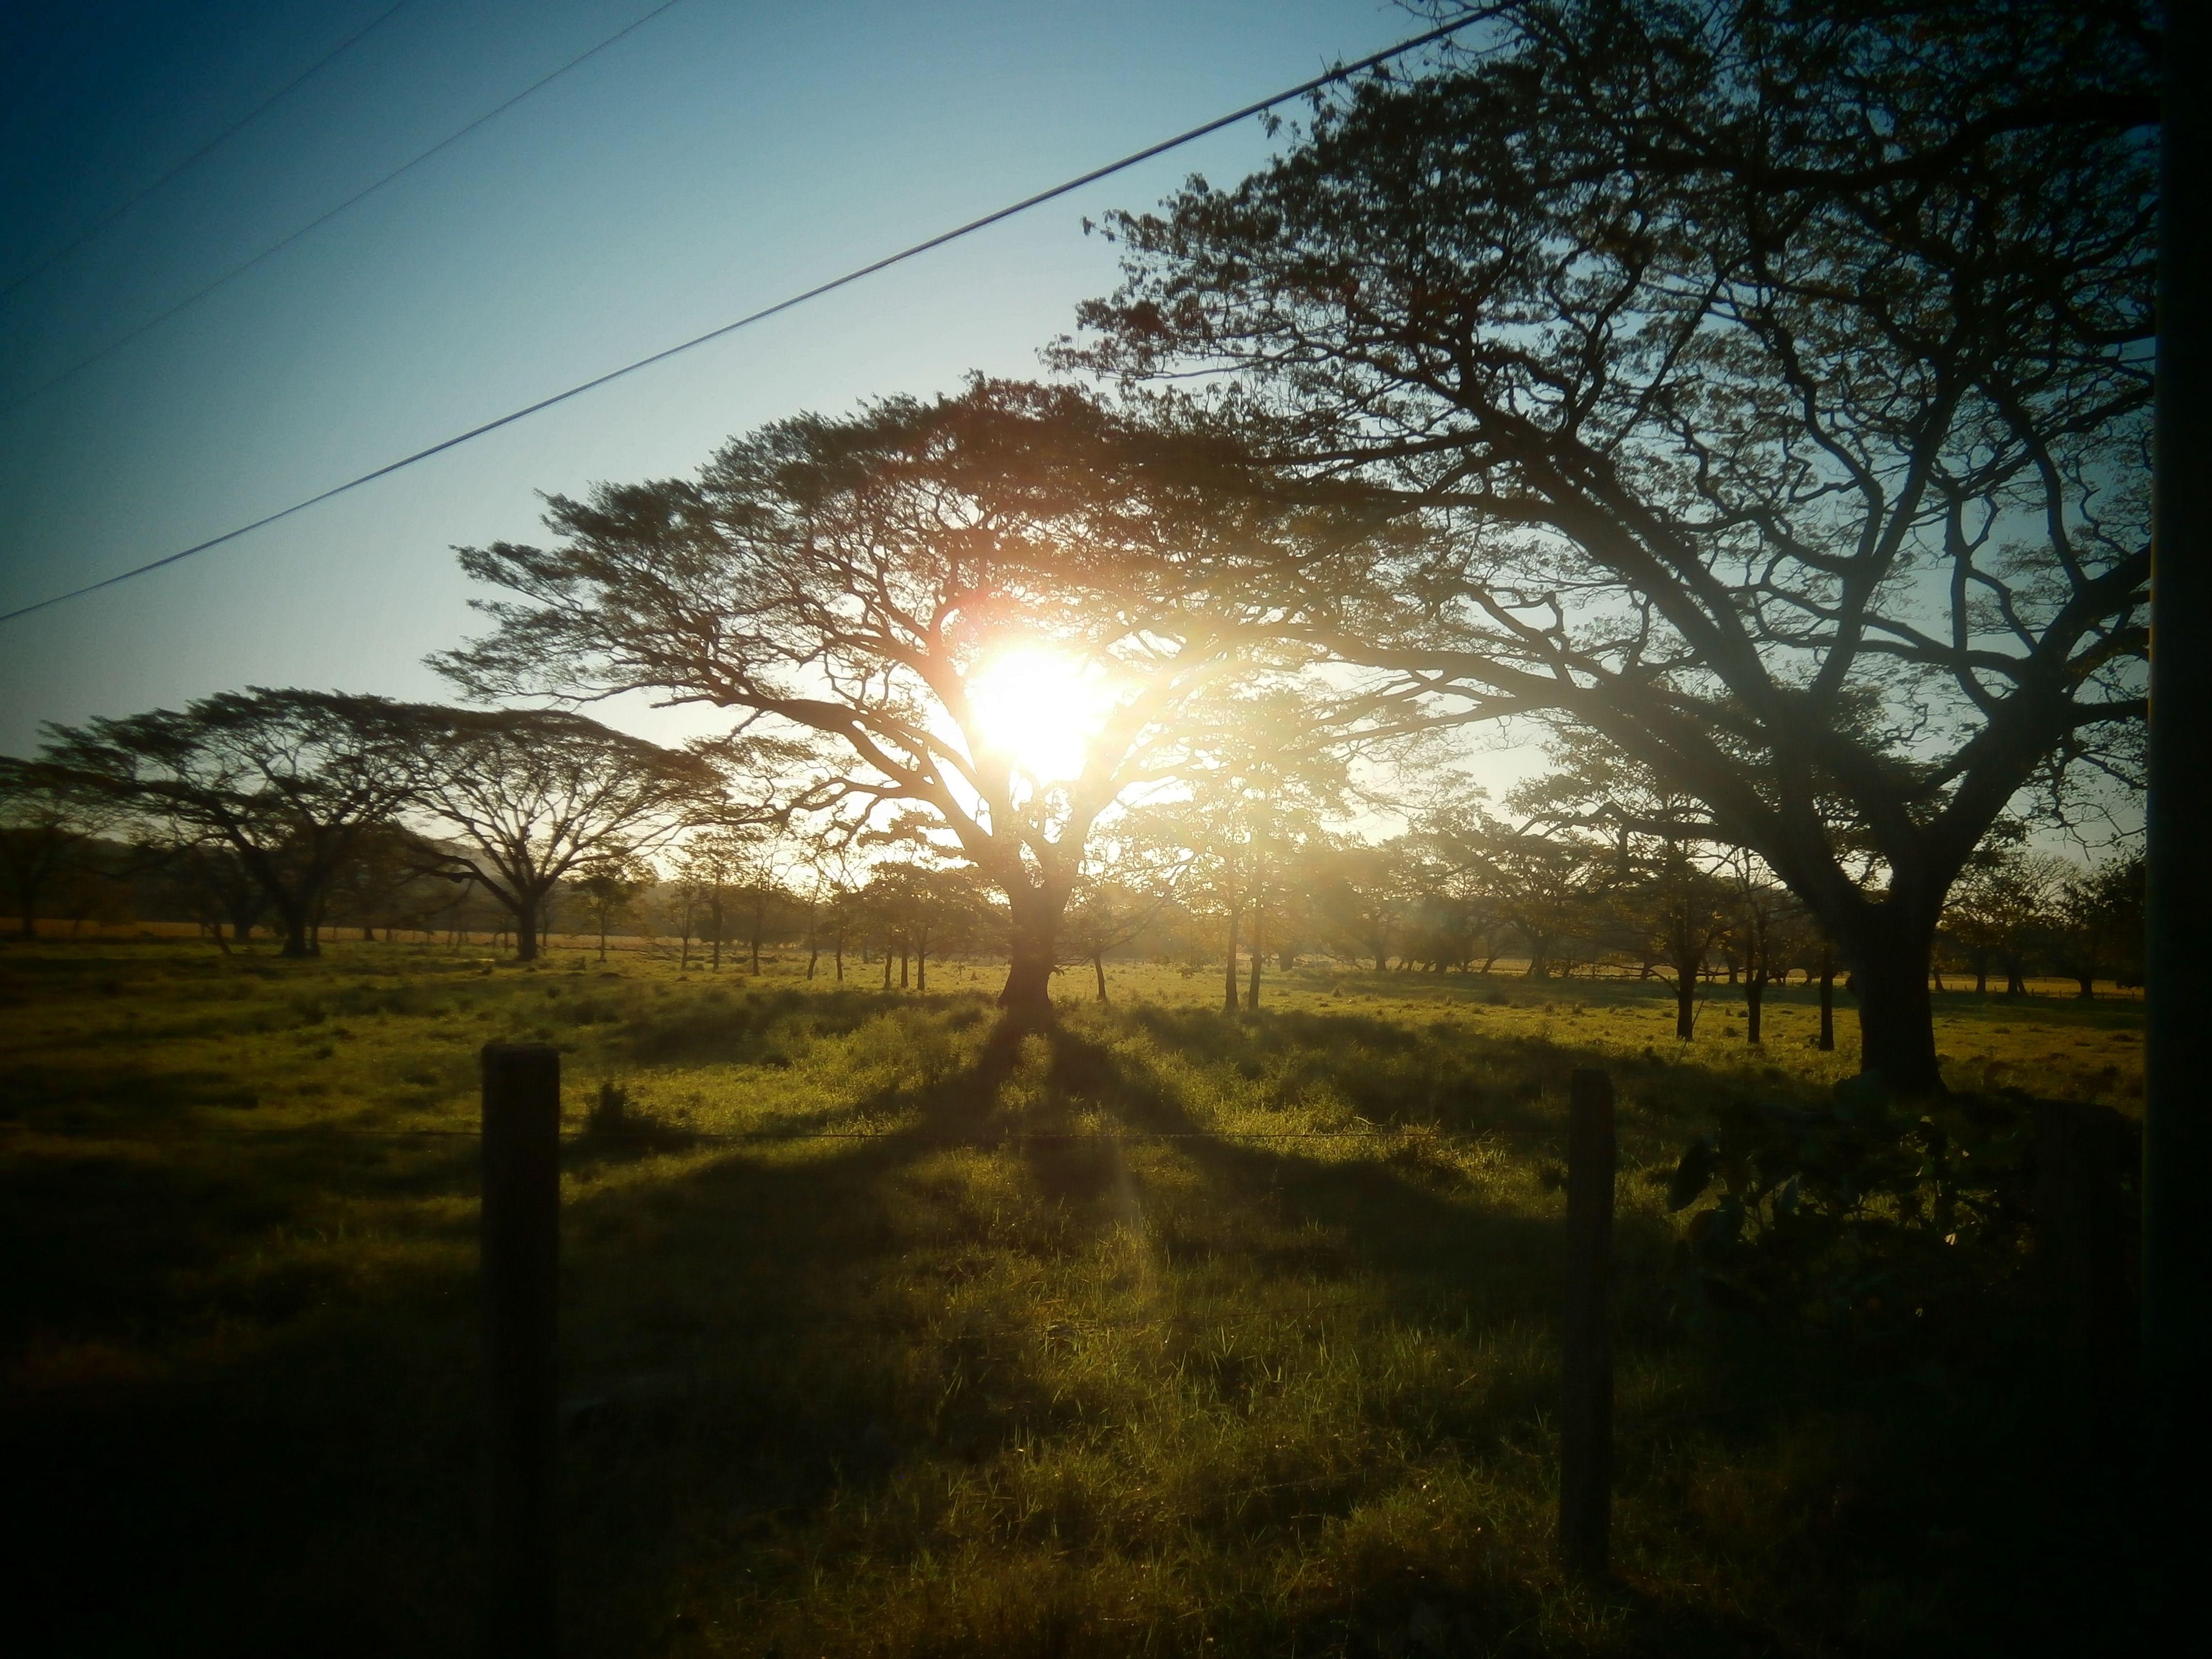 Costa Rica, beauty of nature in Guanacaste http://costarica-relax.com